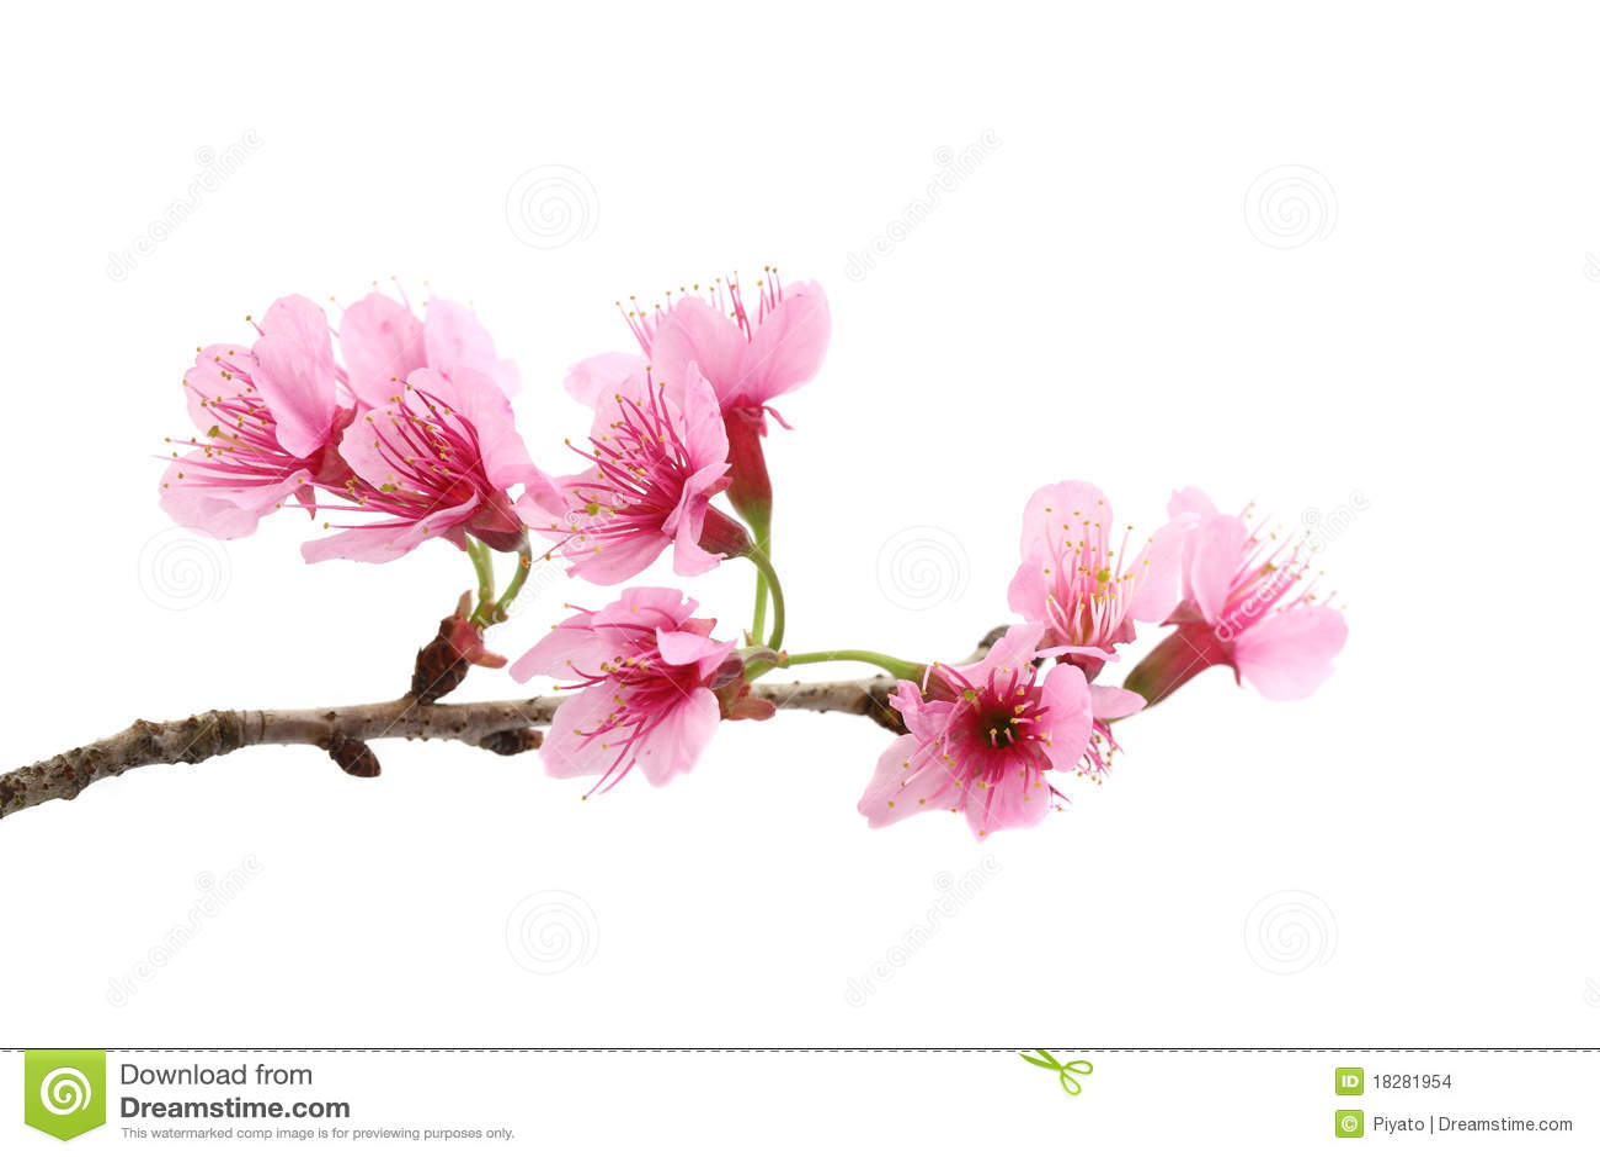 Cherry Blossom Pink Sakura Flower Stock Photo Image Of Close